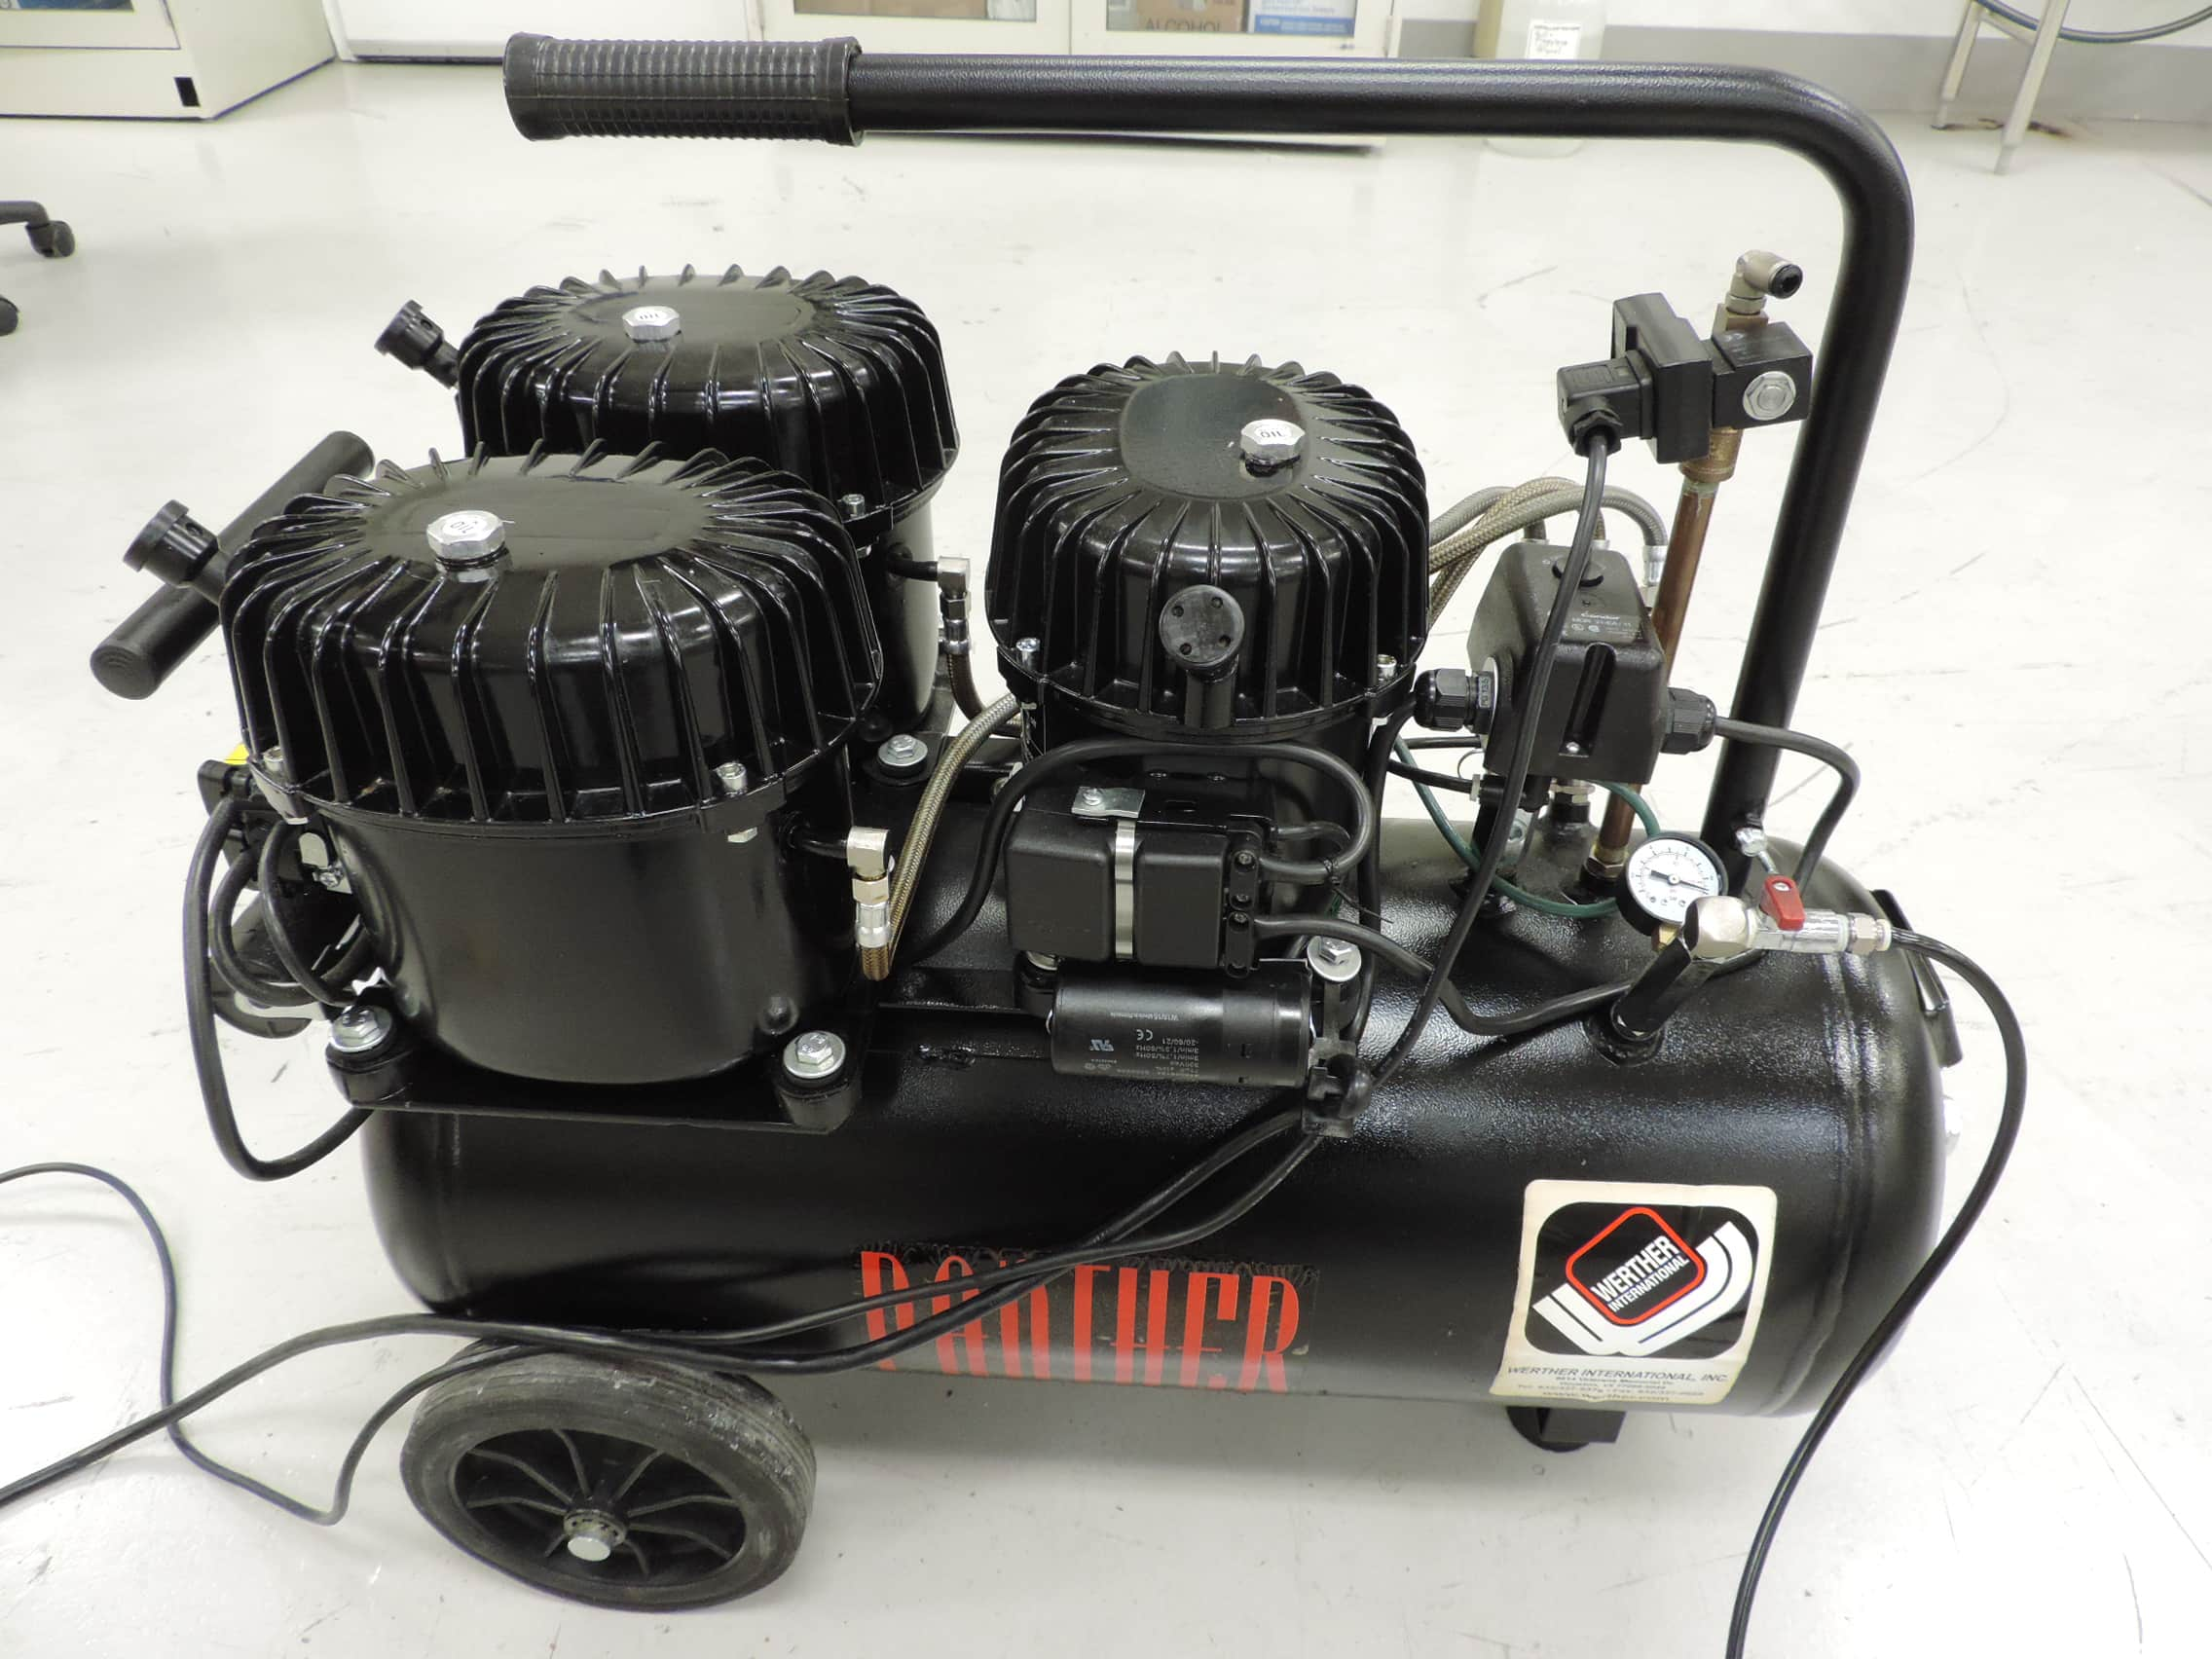 Werther™Panther® P150/50AL 220V Ultraquiet Laboratory Air Compressor